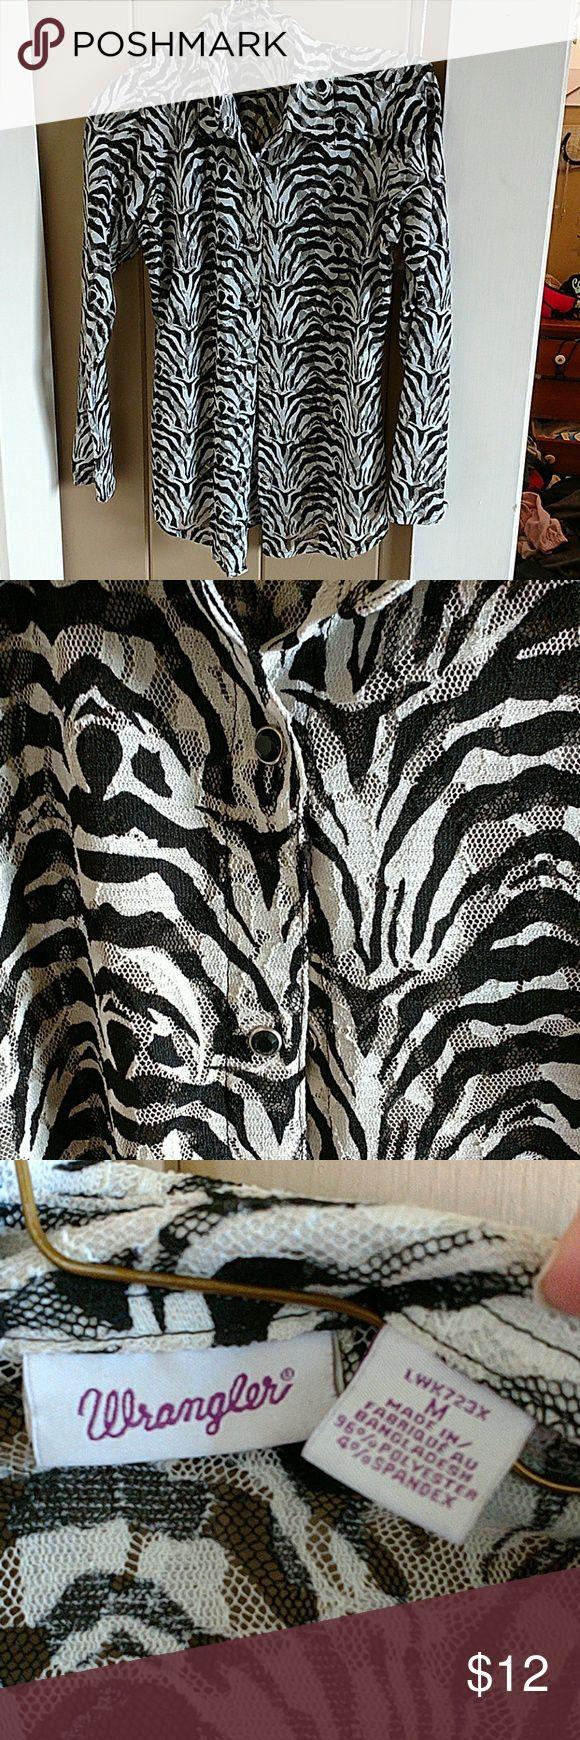 Cute zebra print button down Wrangler shirt! Super cute button down shirt I've actually never worn!! Feel free to make an offer. Wrangler Tops Button Down Shirts